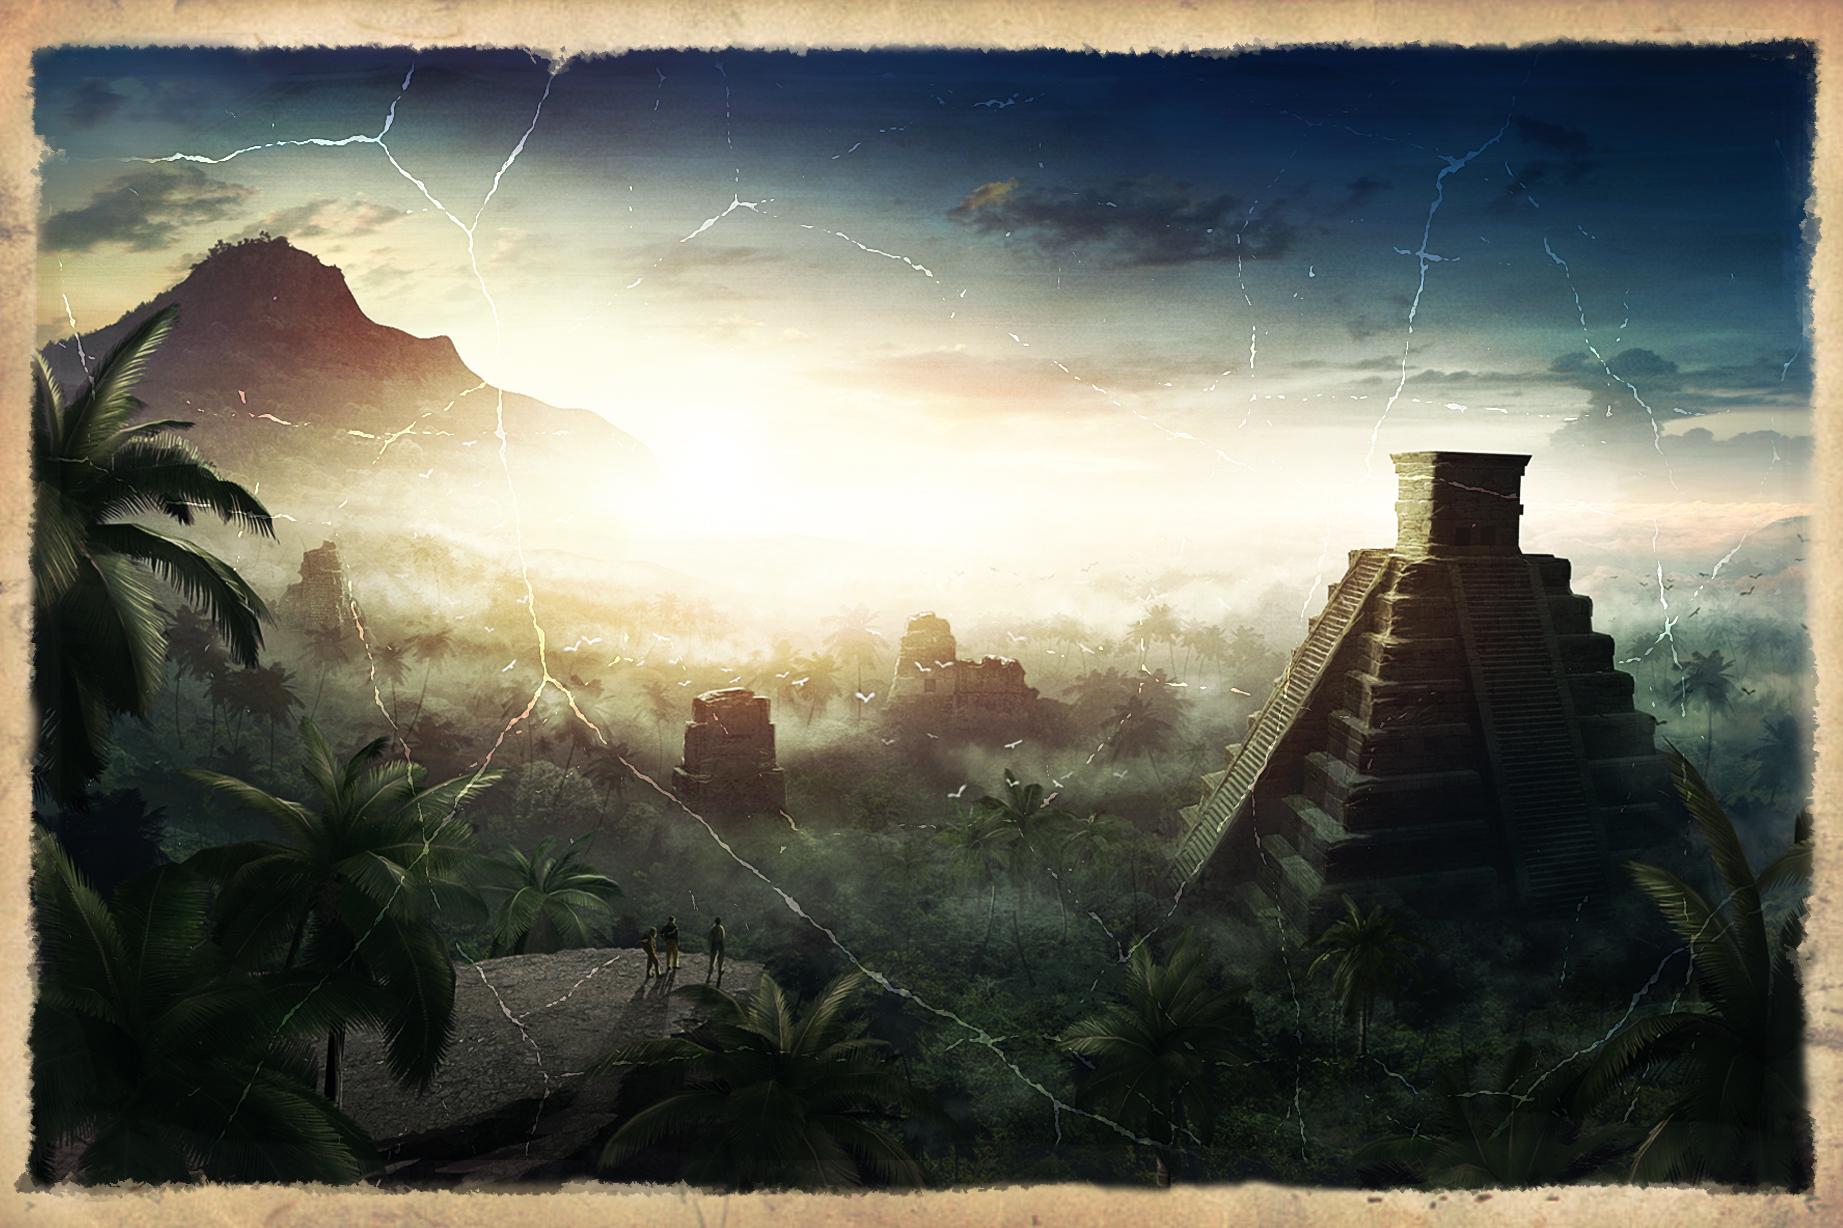 deadfall adventures background mayan - photo #6